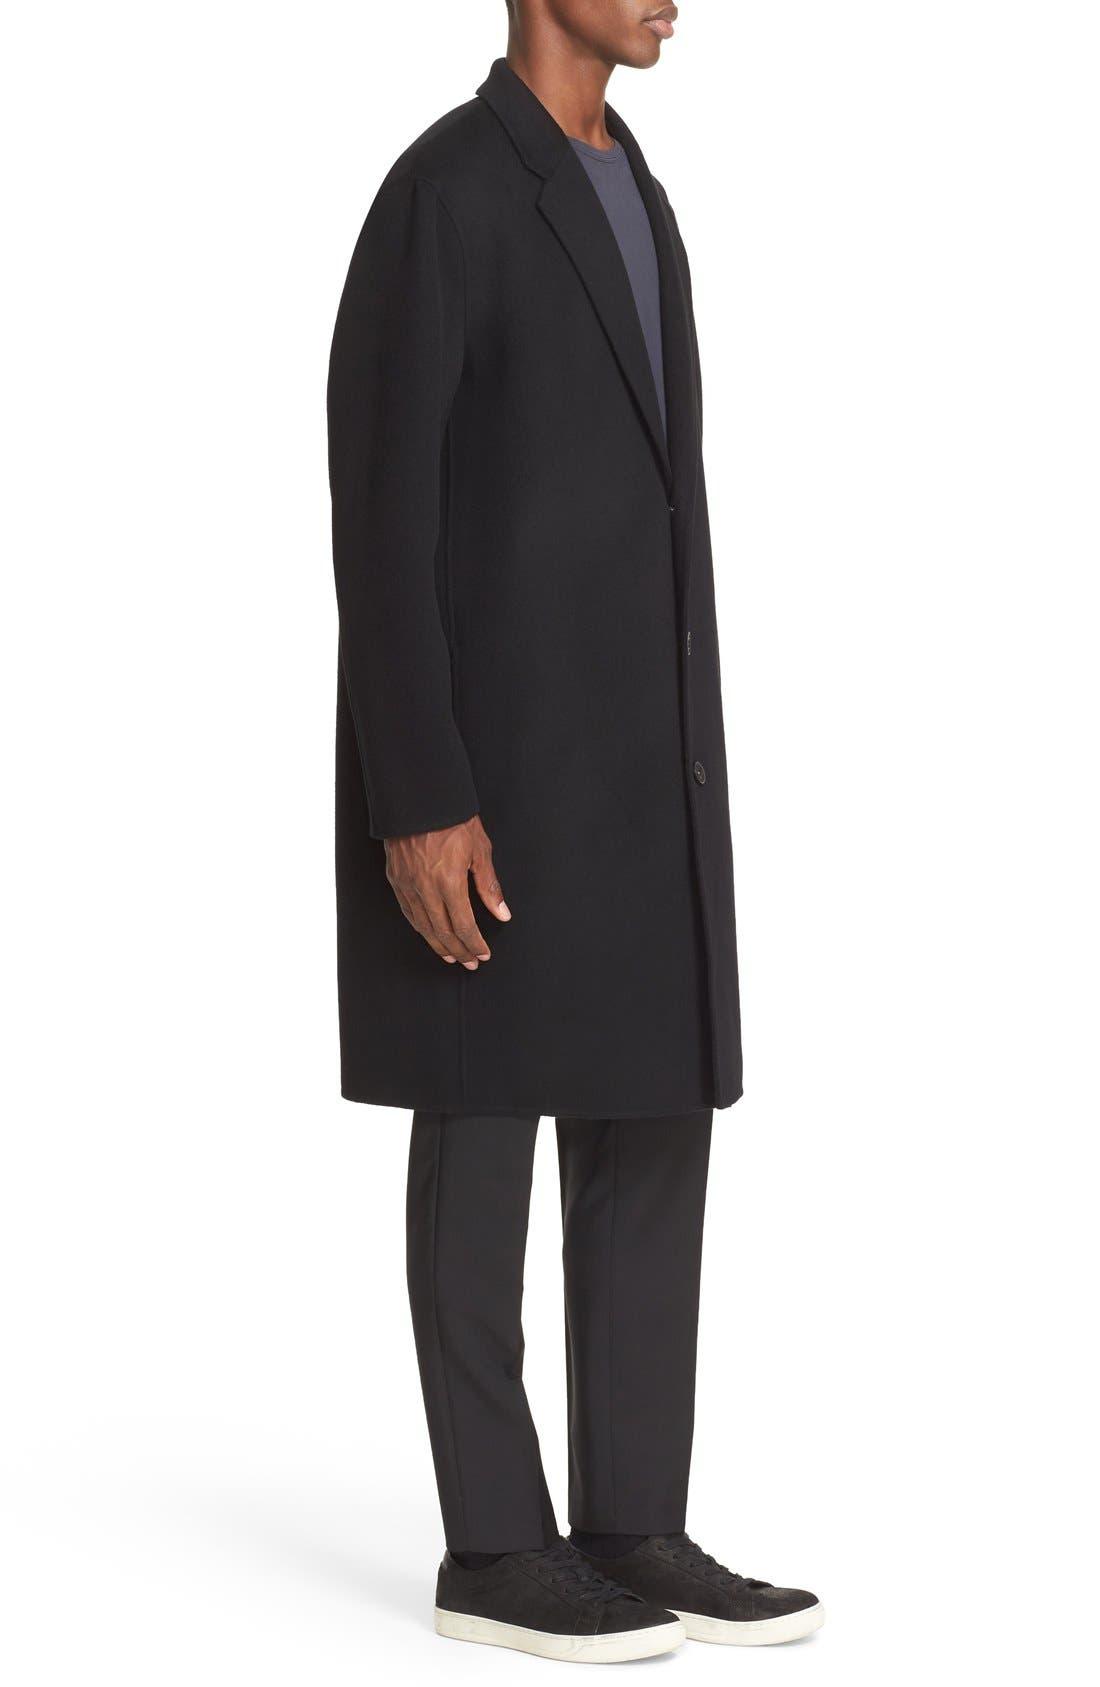 Charles Wool & Cashmere Coat,                             Alternate thumbnail 3, color,                             Black